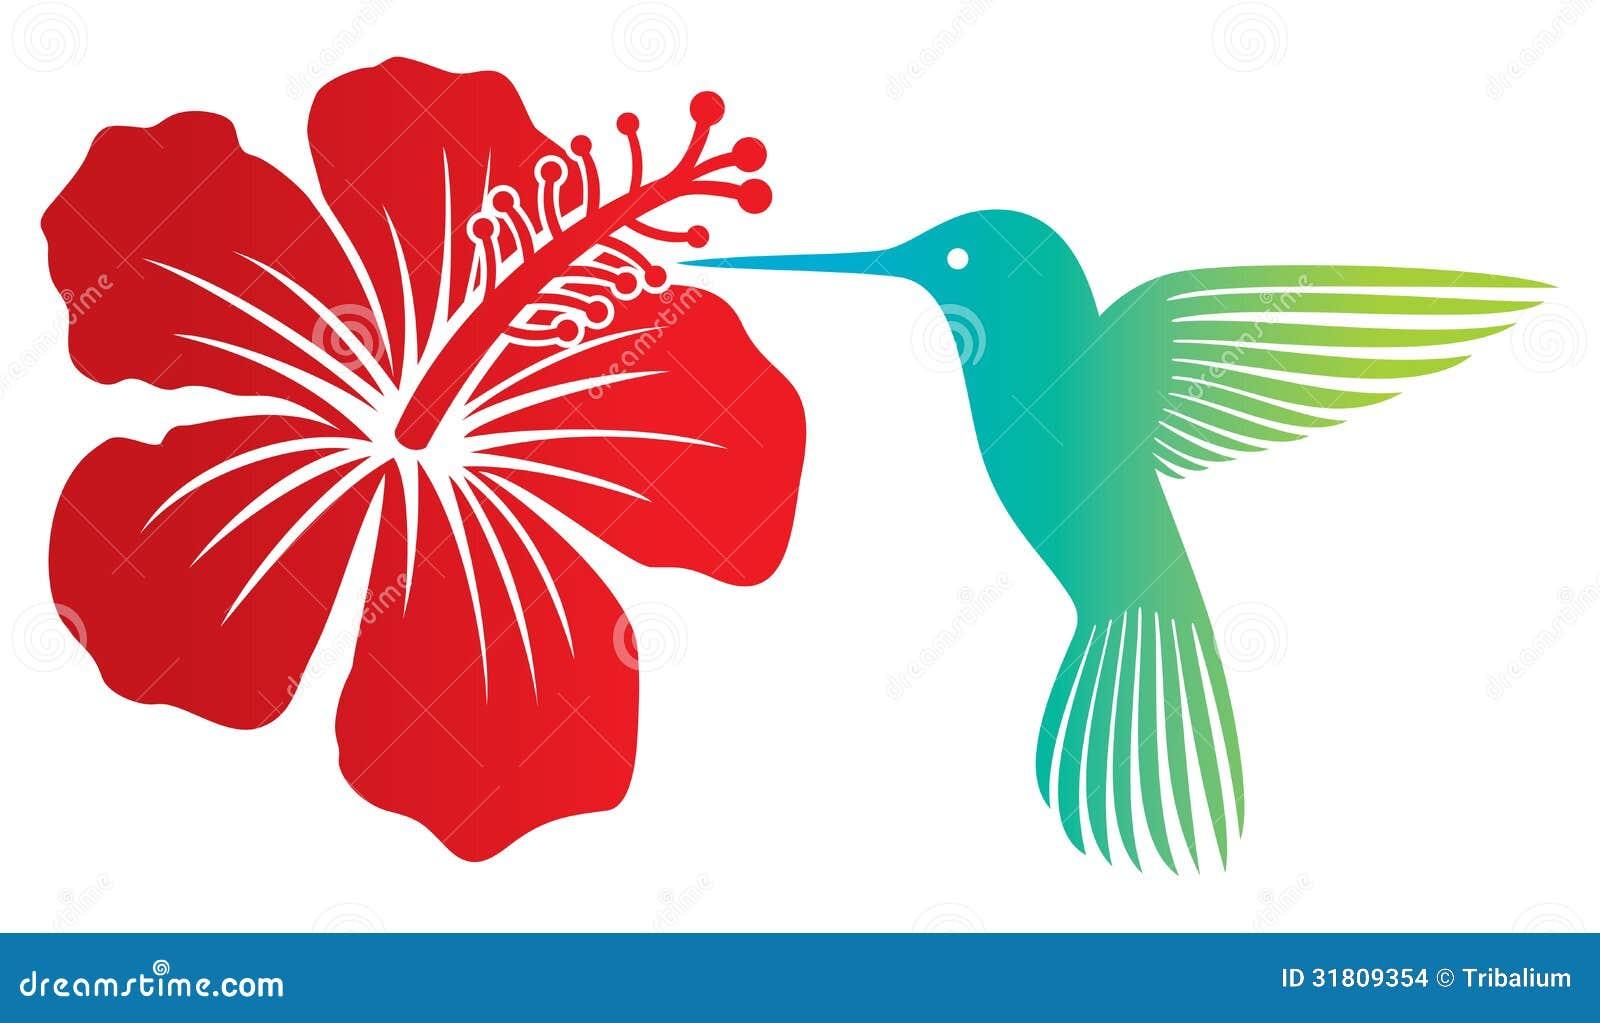 Colibri Hibiscus colibri and flower stock vector. illustration of animal - 31809354